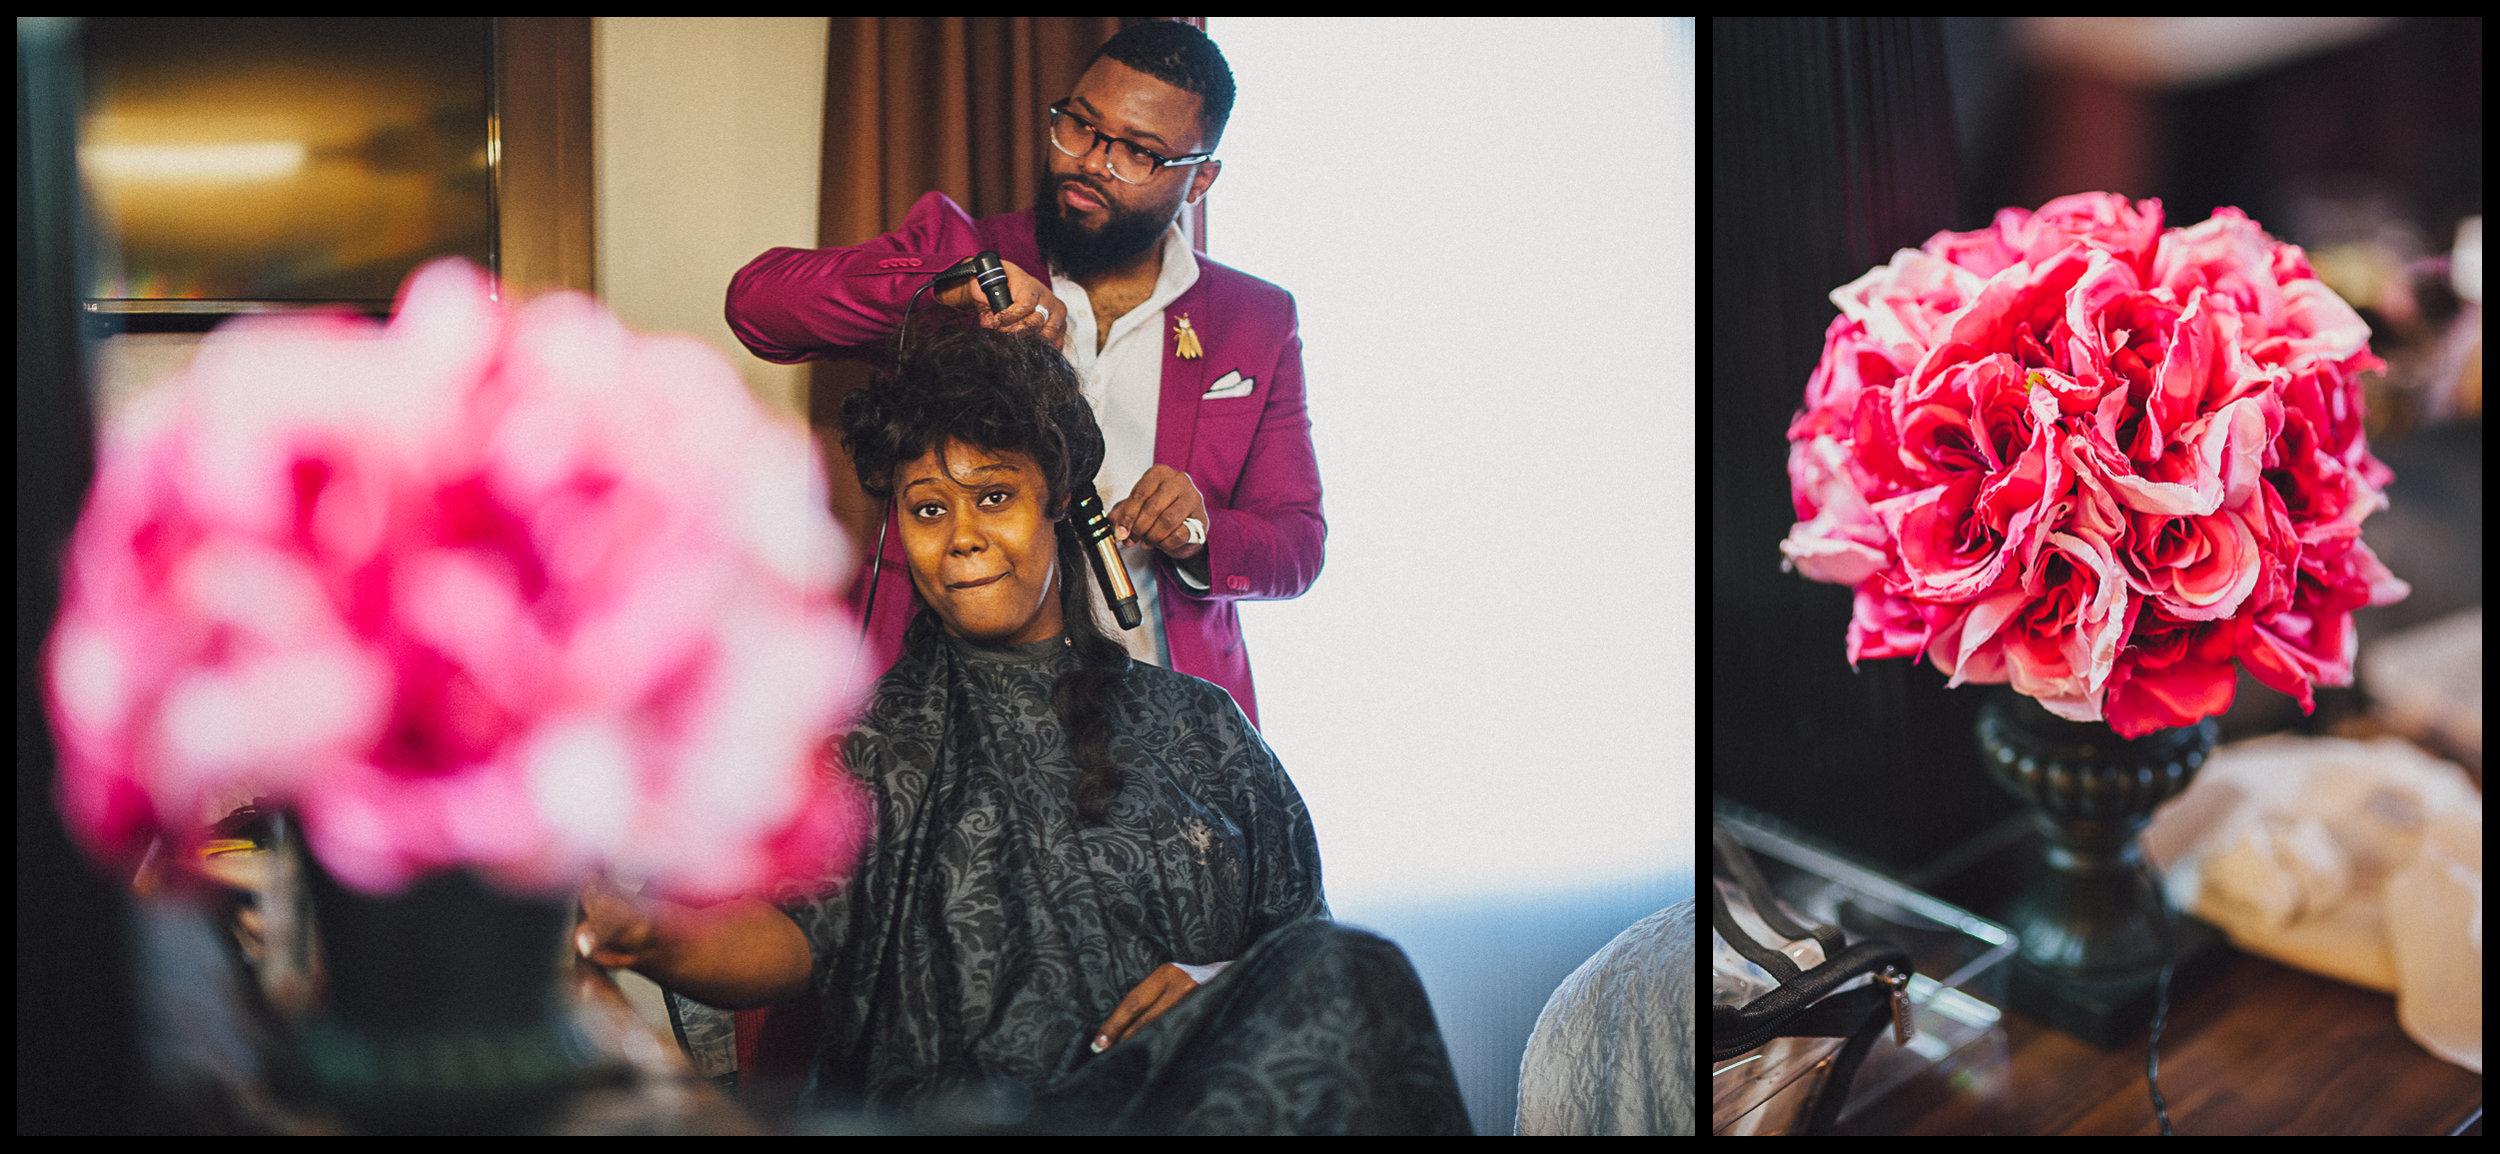 Jameesa and Maurice Collage 10.jpg